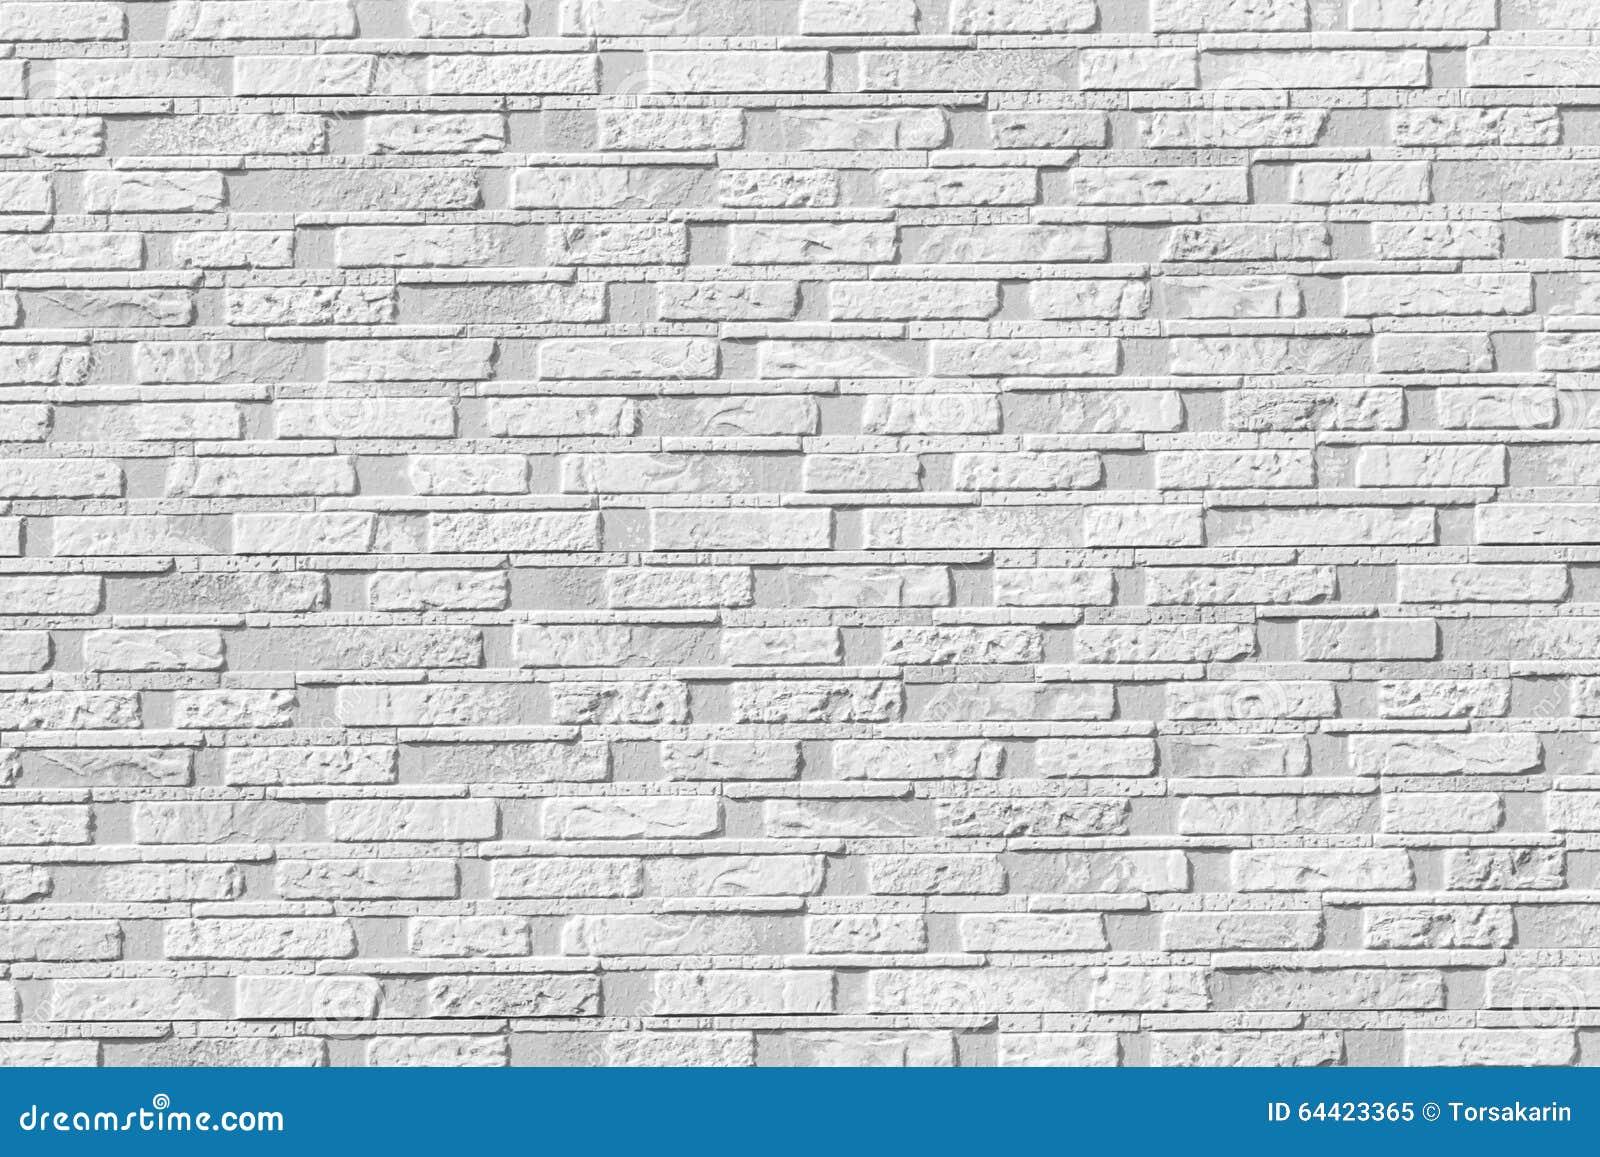 White Brick Stone Wall Seamless Background Stock Image